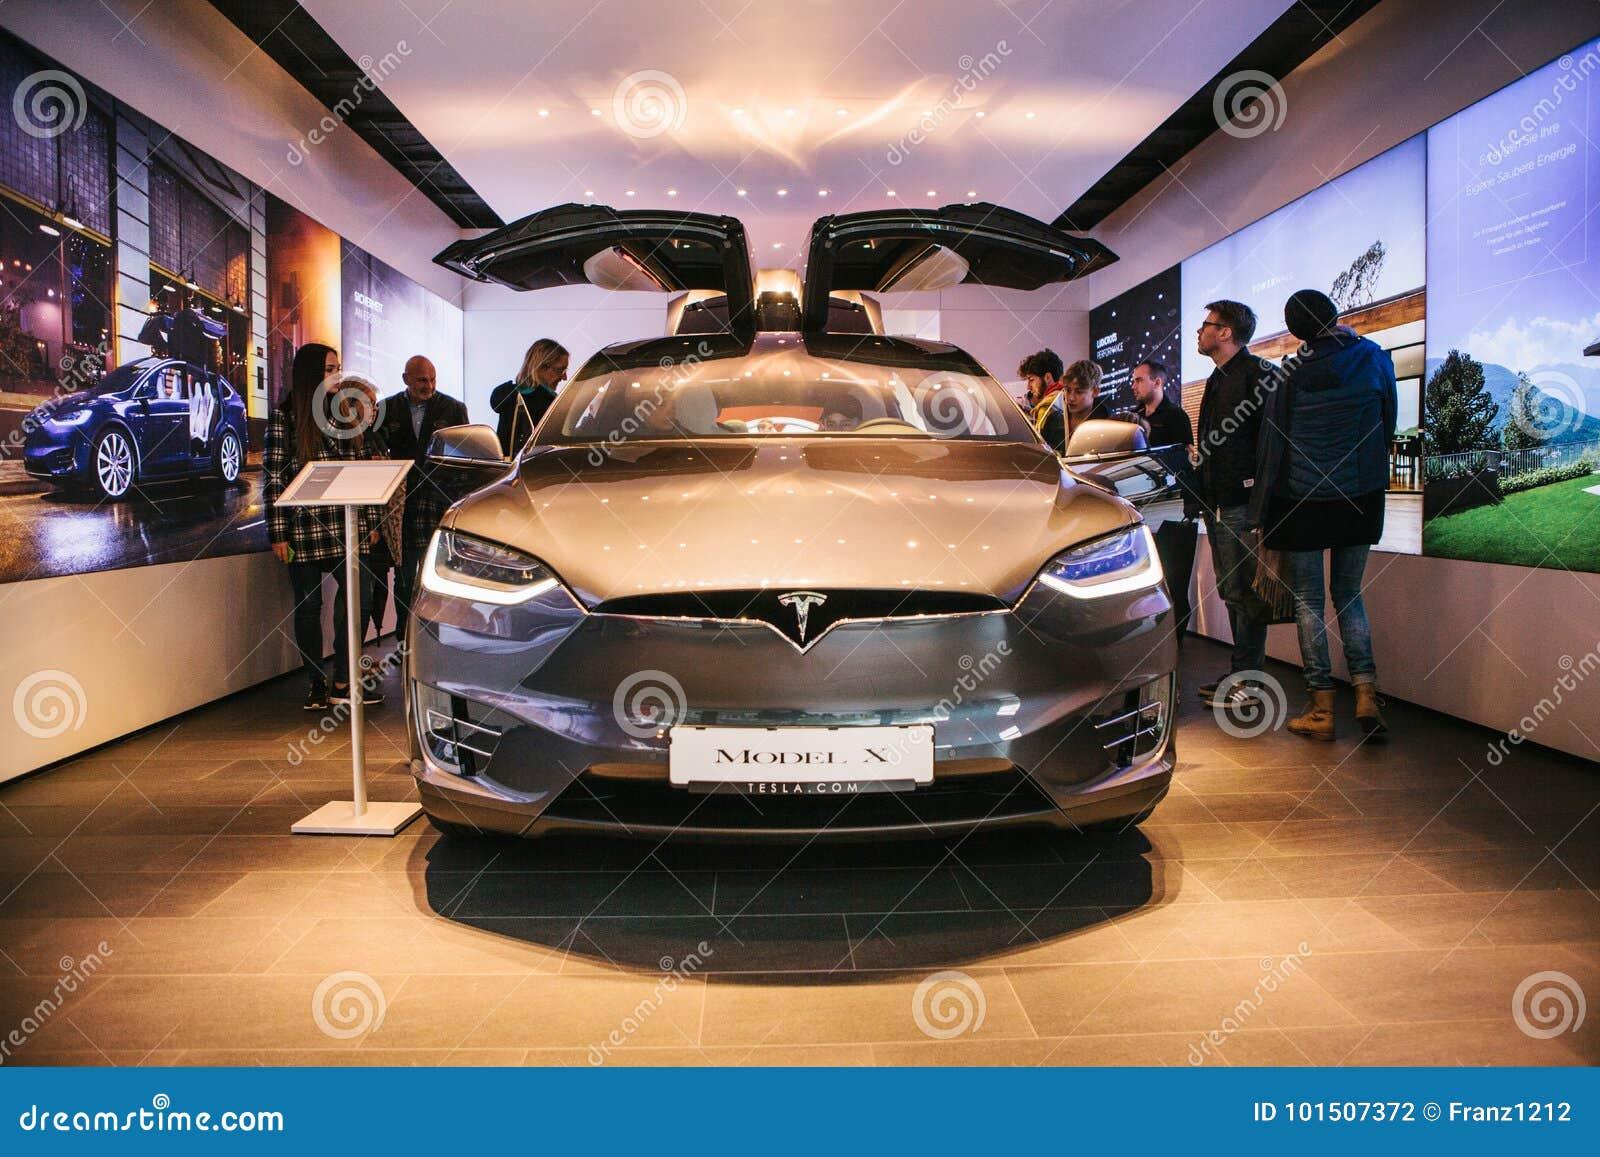 Berlin, October 2, 2017: Presentation of an electric vehicle Tesla model X at the Tesla motor show in Berlin.